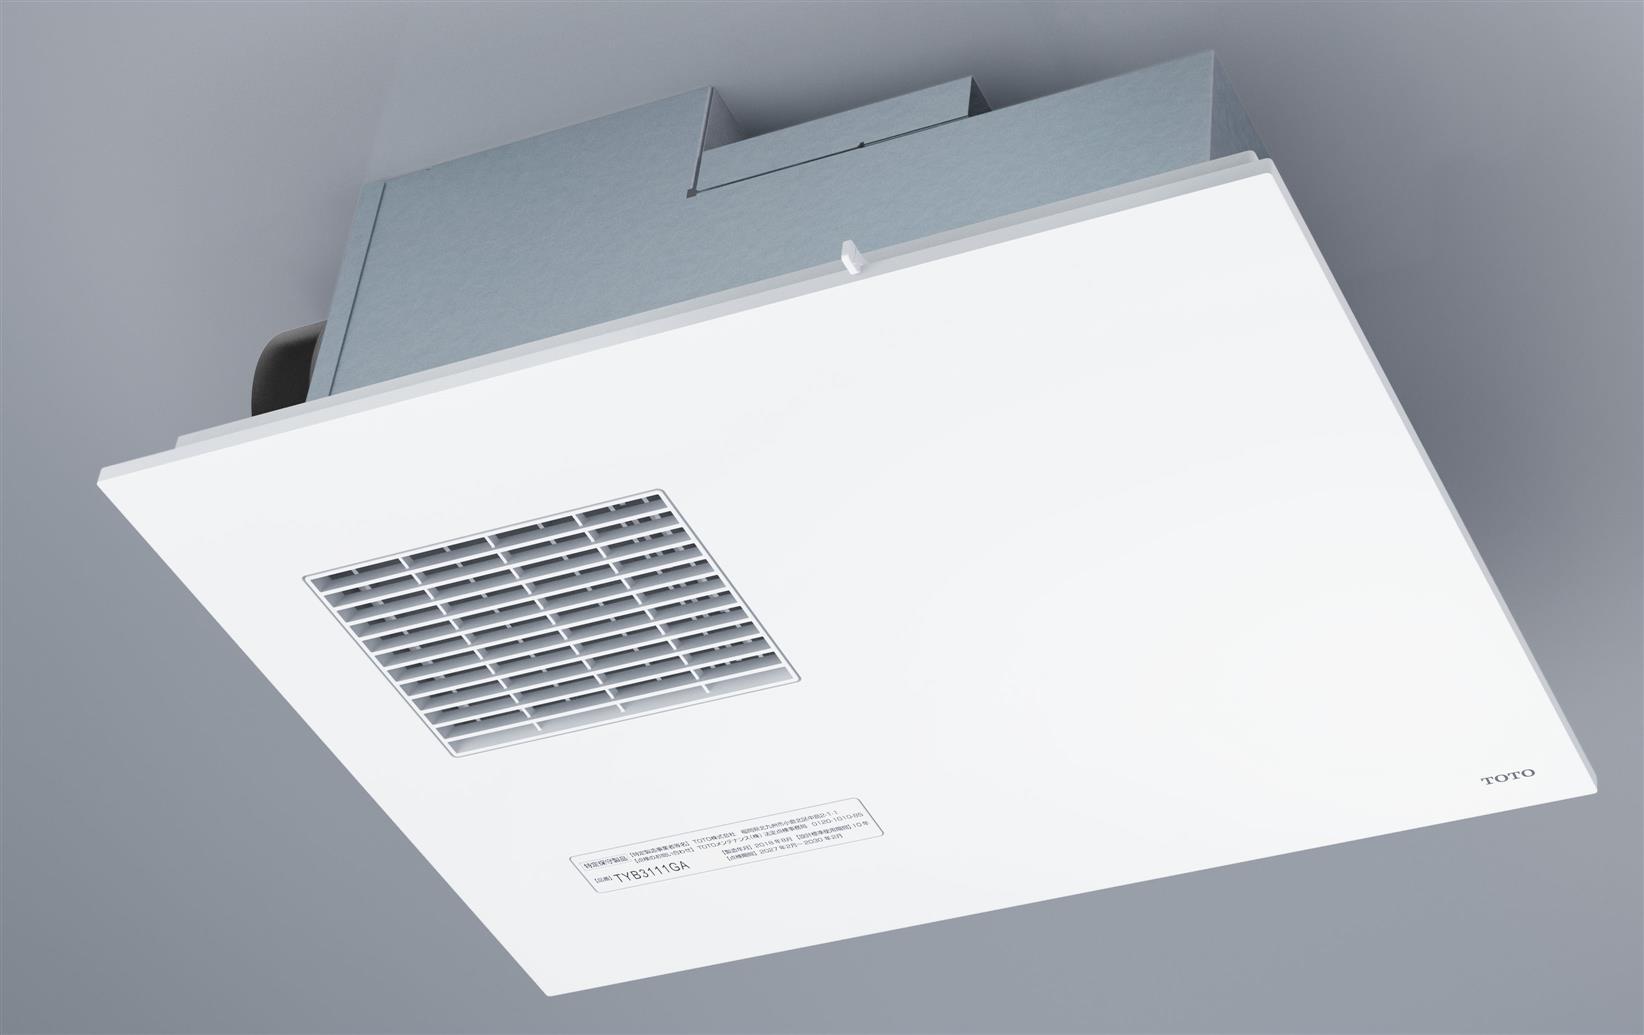 TOTO 浴室換気暖房乾燥機「三乾王」 1室換気タイプ(200V) TYB3121GA